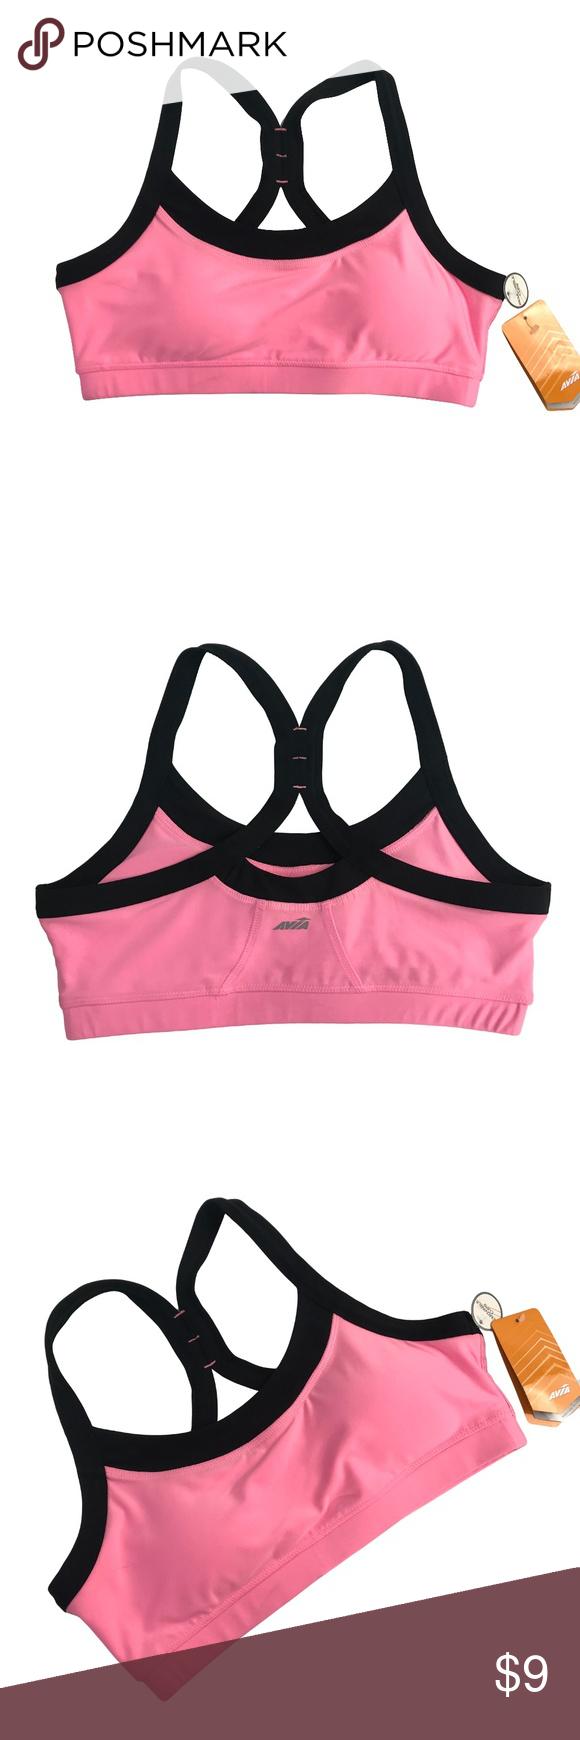 Avia Pink Sports Bra Work out Top NWT Sports bra, Black